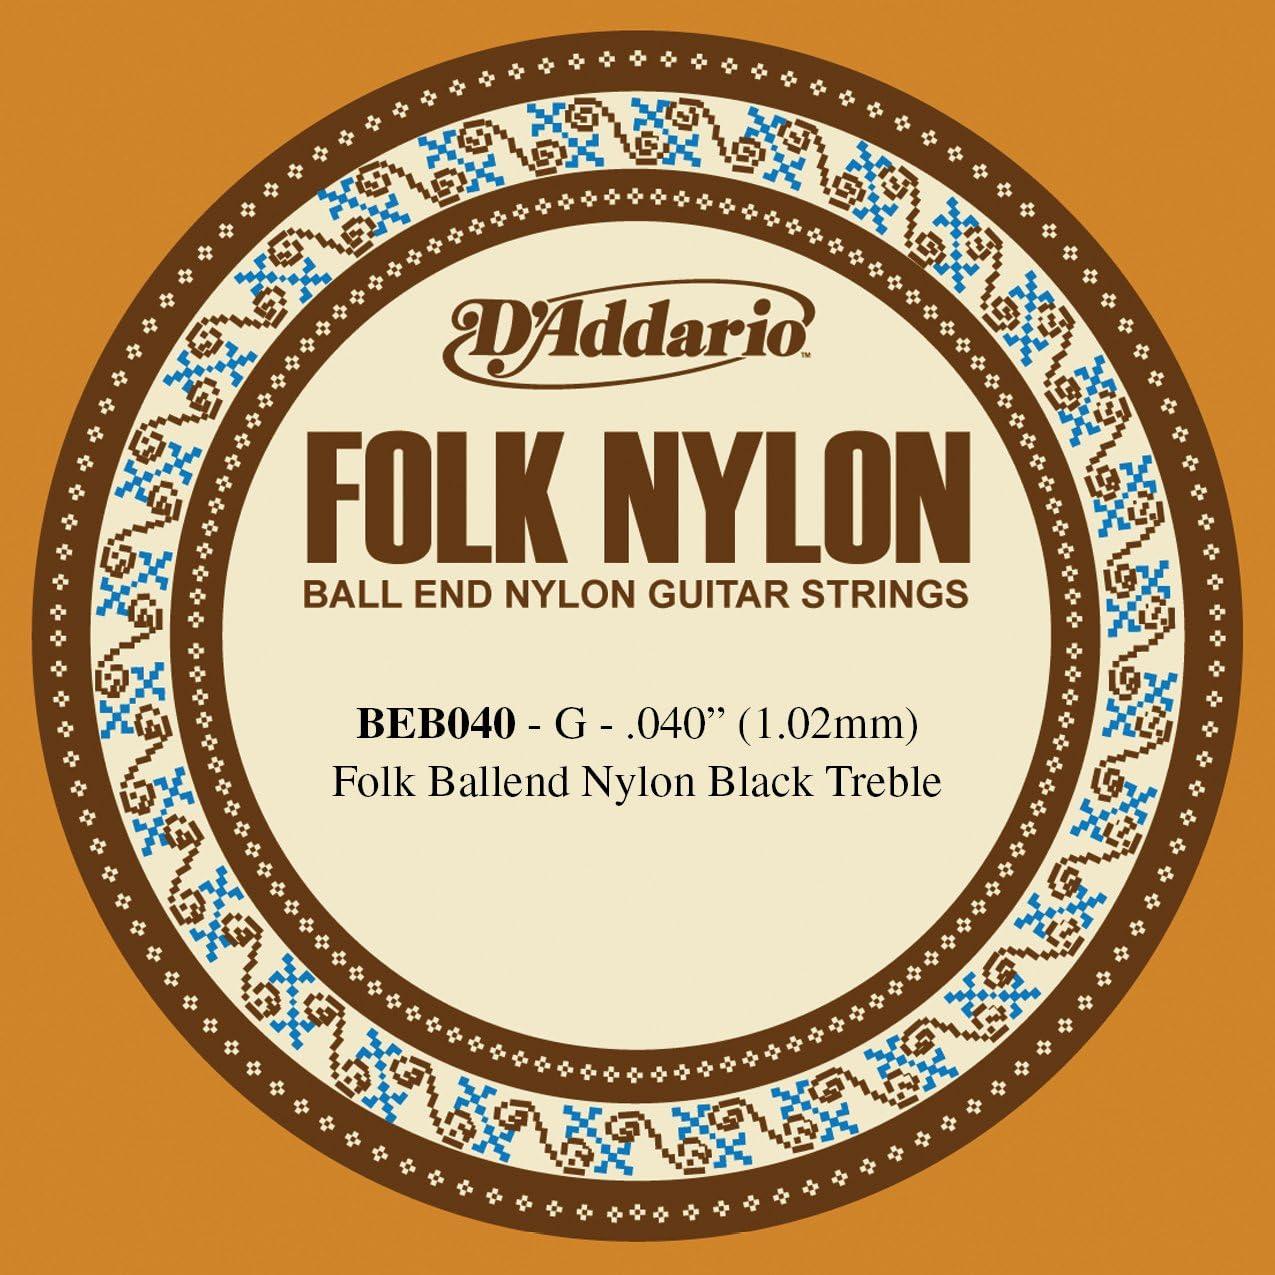 D'Addario BEB040 Folk Nylon, cuerda individual para guitarra, nailon negro, extremo de bola.040